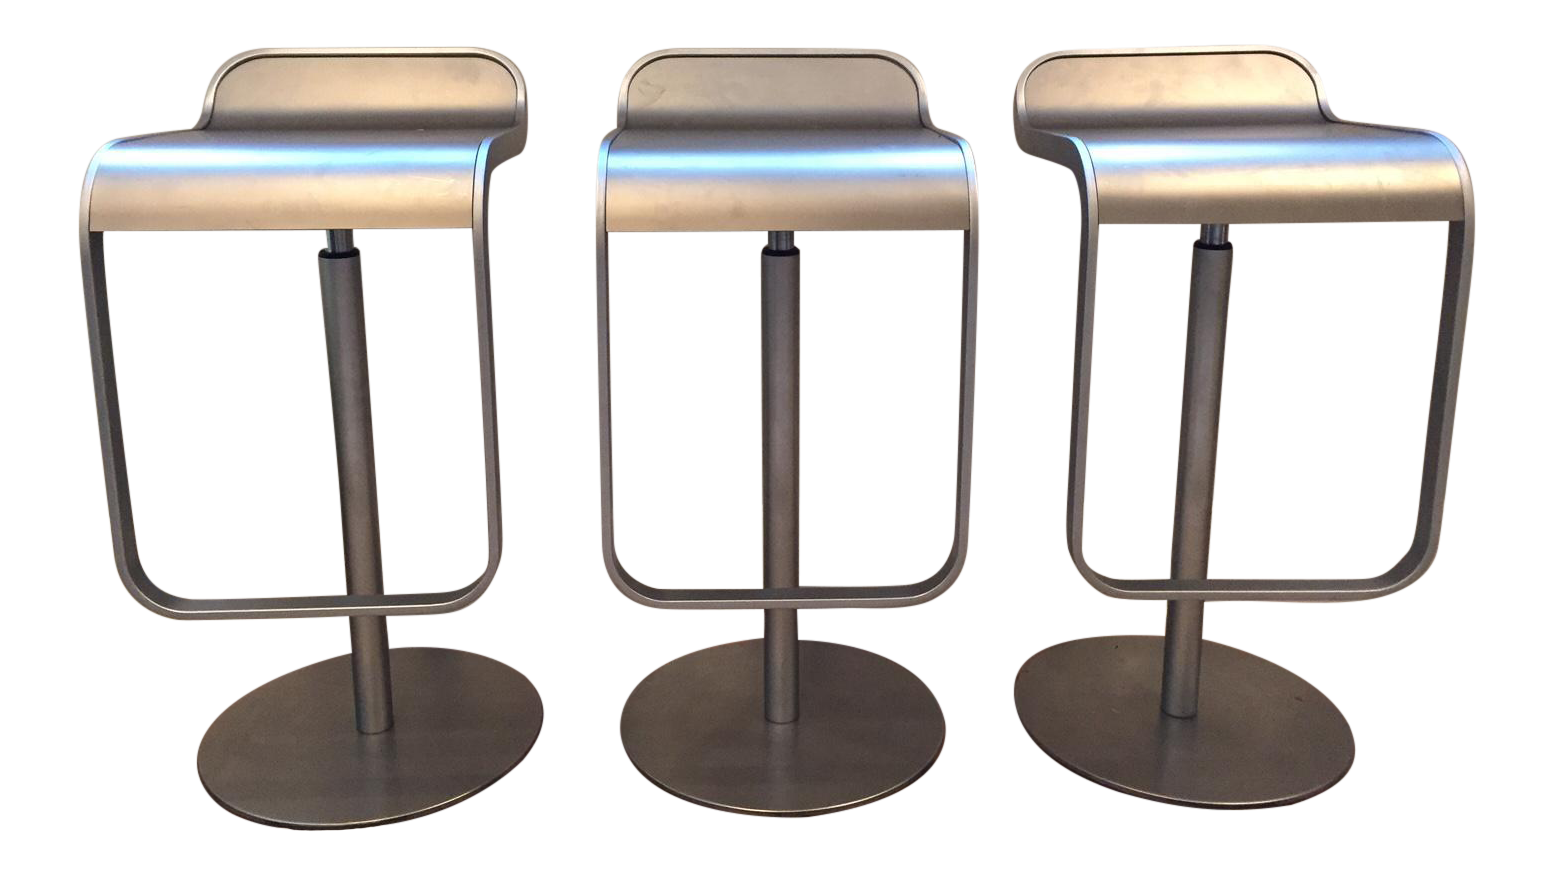 LEM Piston Stainless Steel Bar Stools Set of 3 Chairish : 78f59dd3 c720 4cf9 8bbf 42ad91387161aspectfitampwidth640ampheight640 from www.chairish.com size 640 x 640 jpeg 25kB